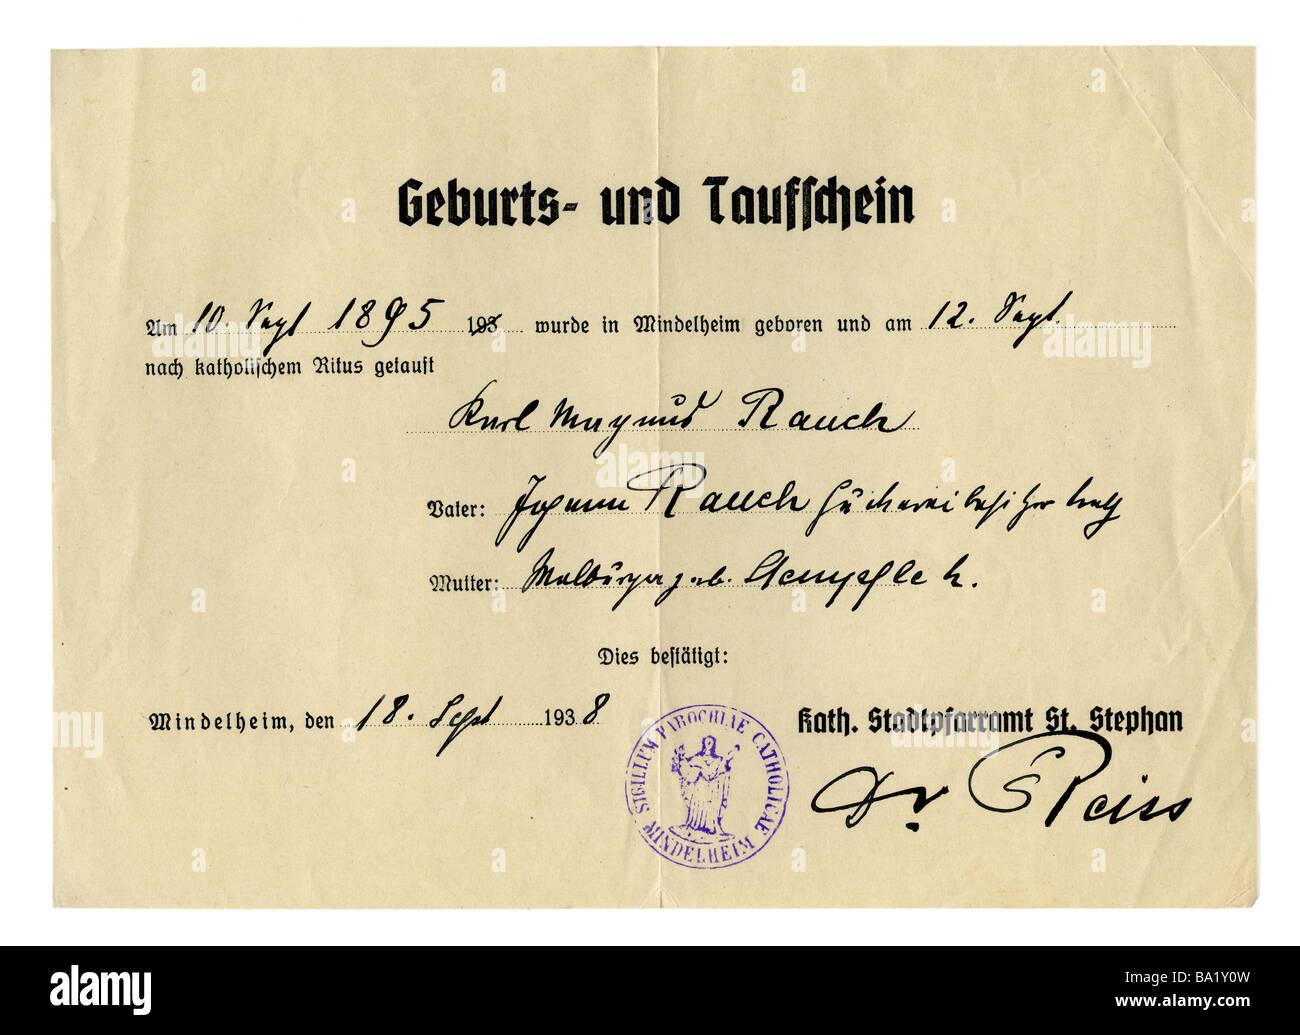 Karl Rauch Stockfotos & Karl Rauch Bilder - Alamy